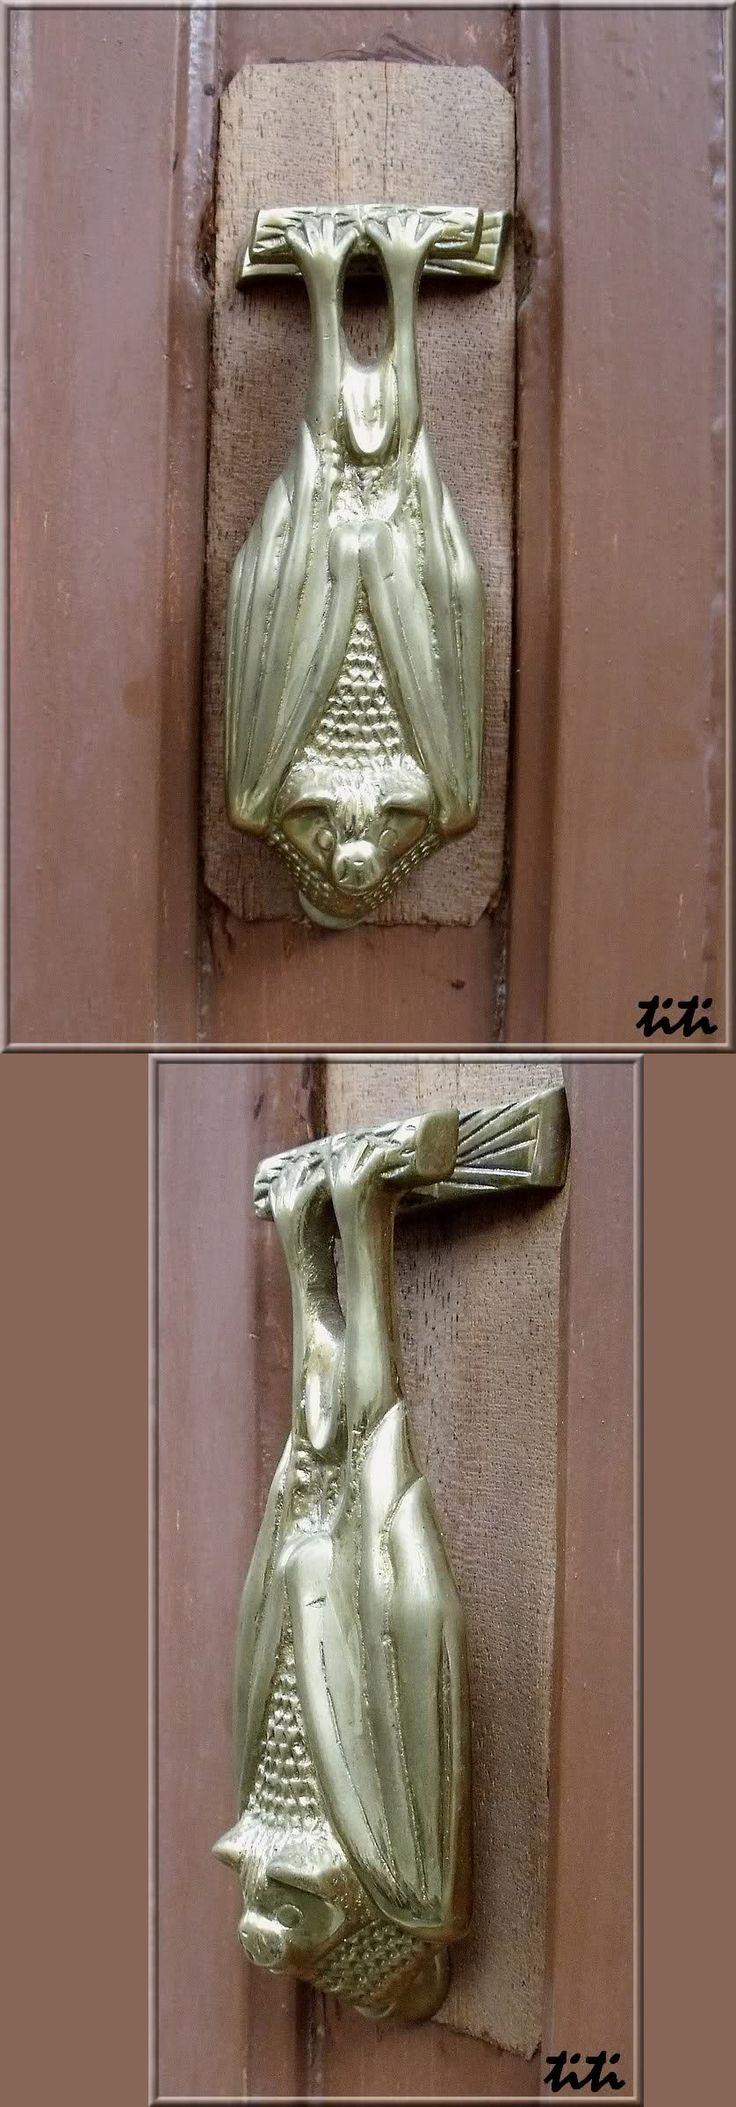 Bat Door Knocker. Serrière, Ardèche (France).